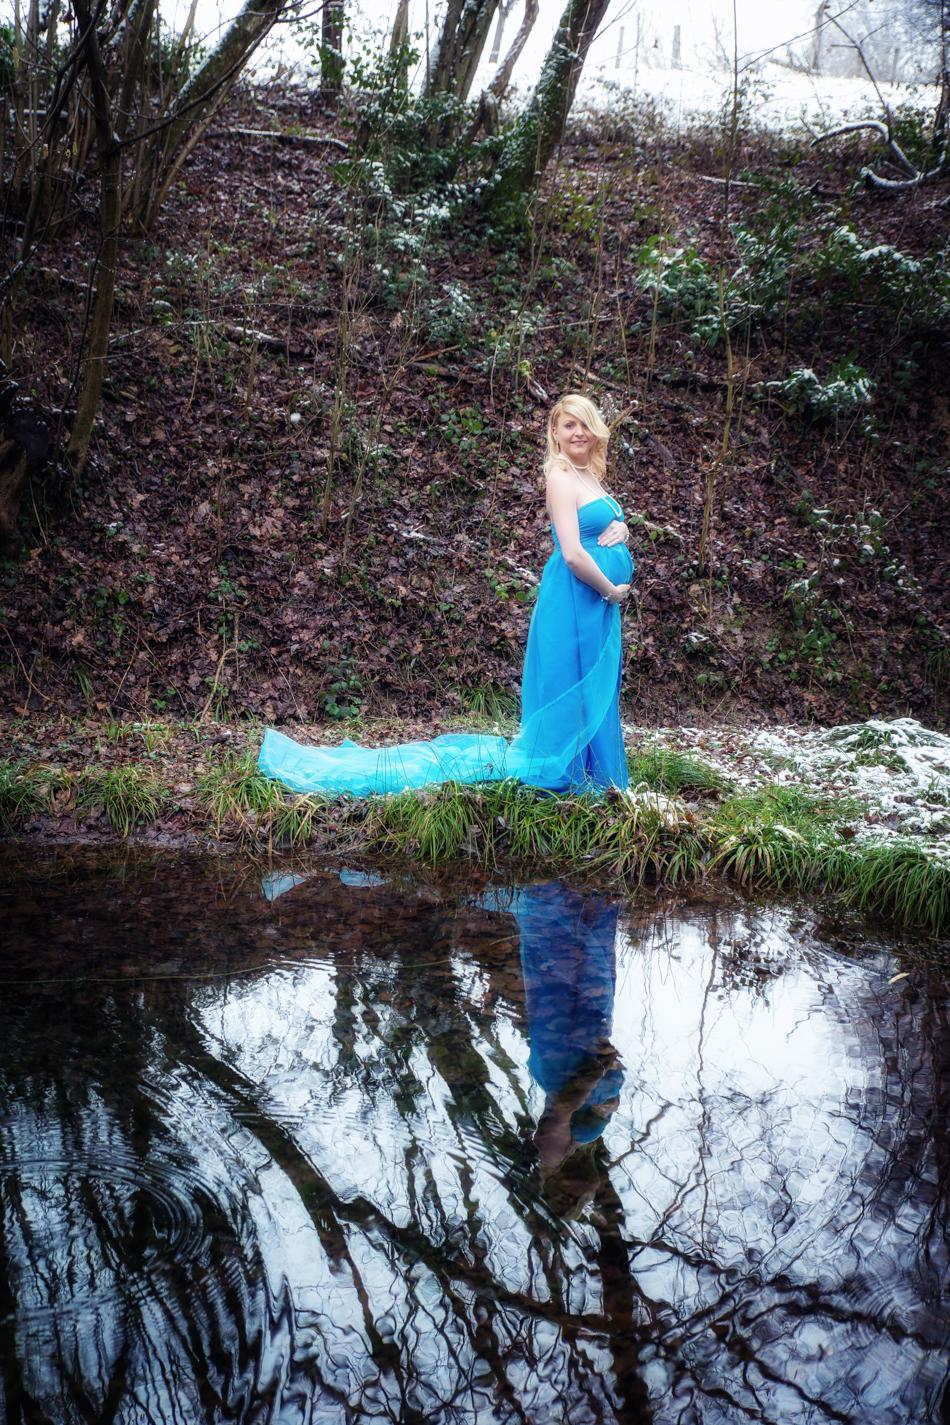 Schwangerschaftsshooting-Babybauchfotos-Fotograf-Basel-Loerrach-Rheinfelden (2 von 3)